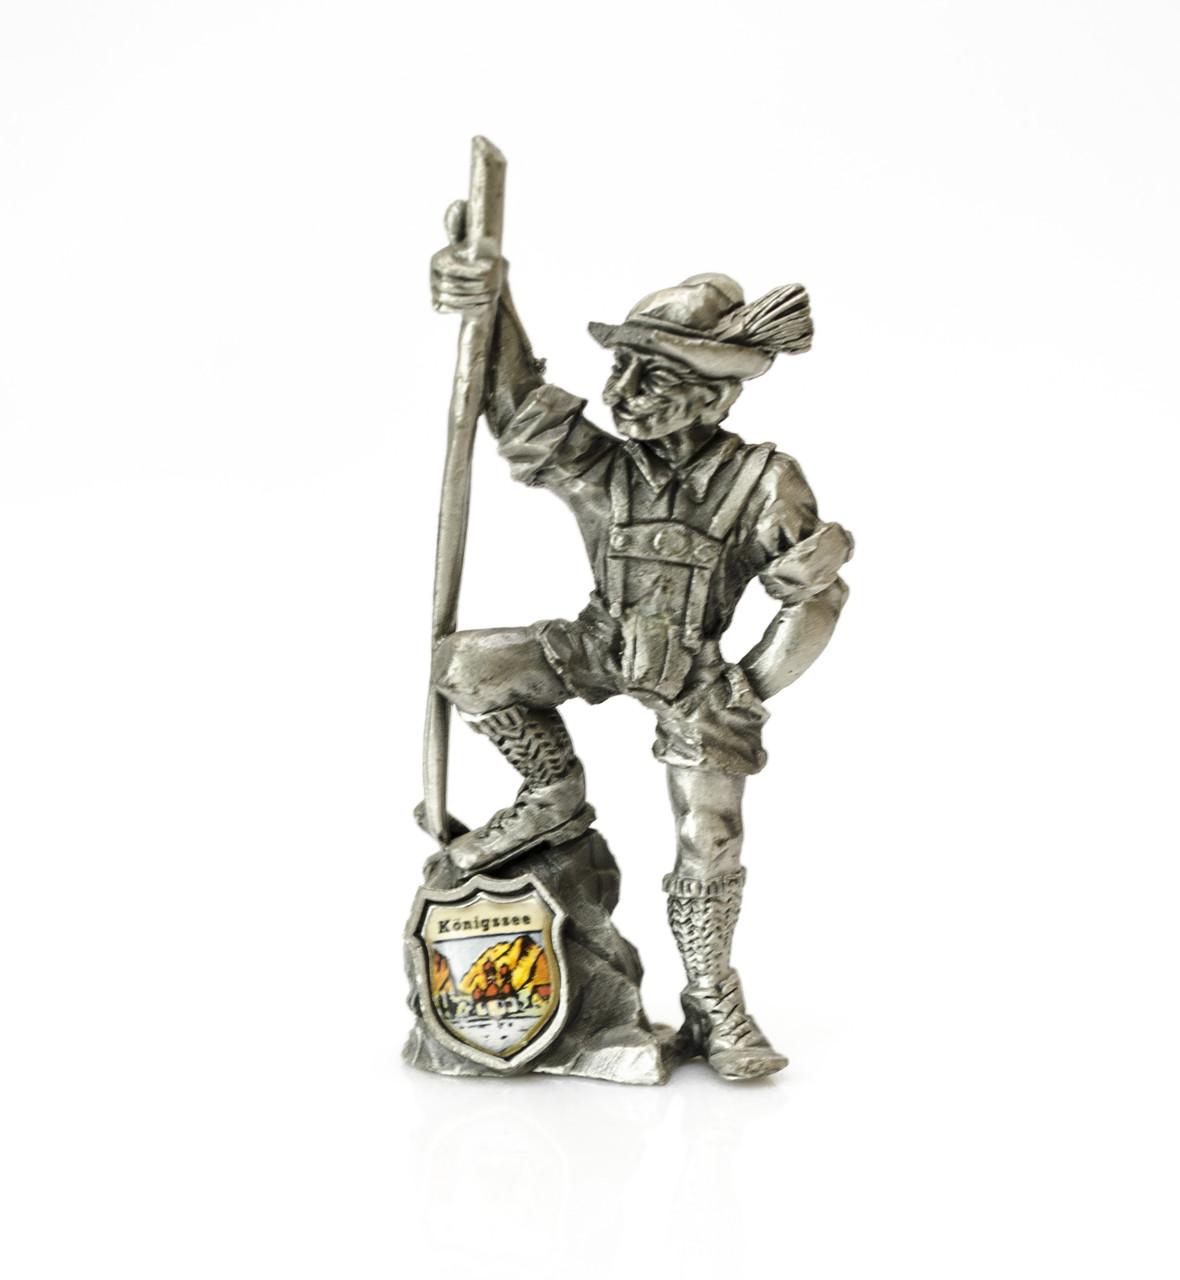 Скульптура, миниатюра, Königssee, олово,  Германия